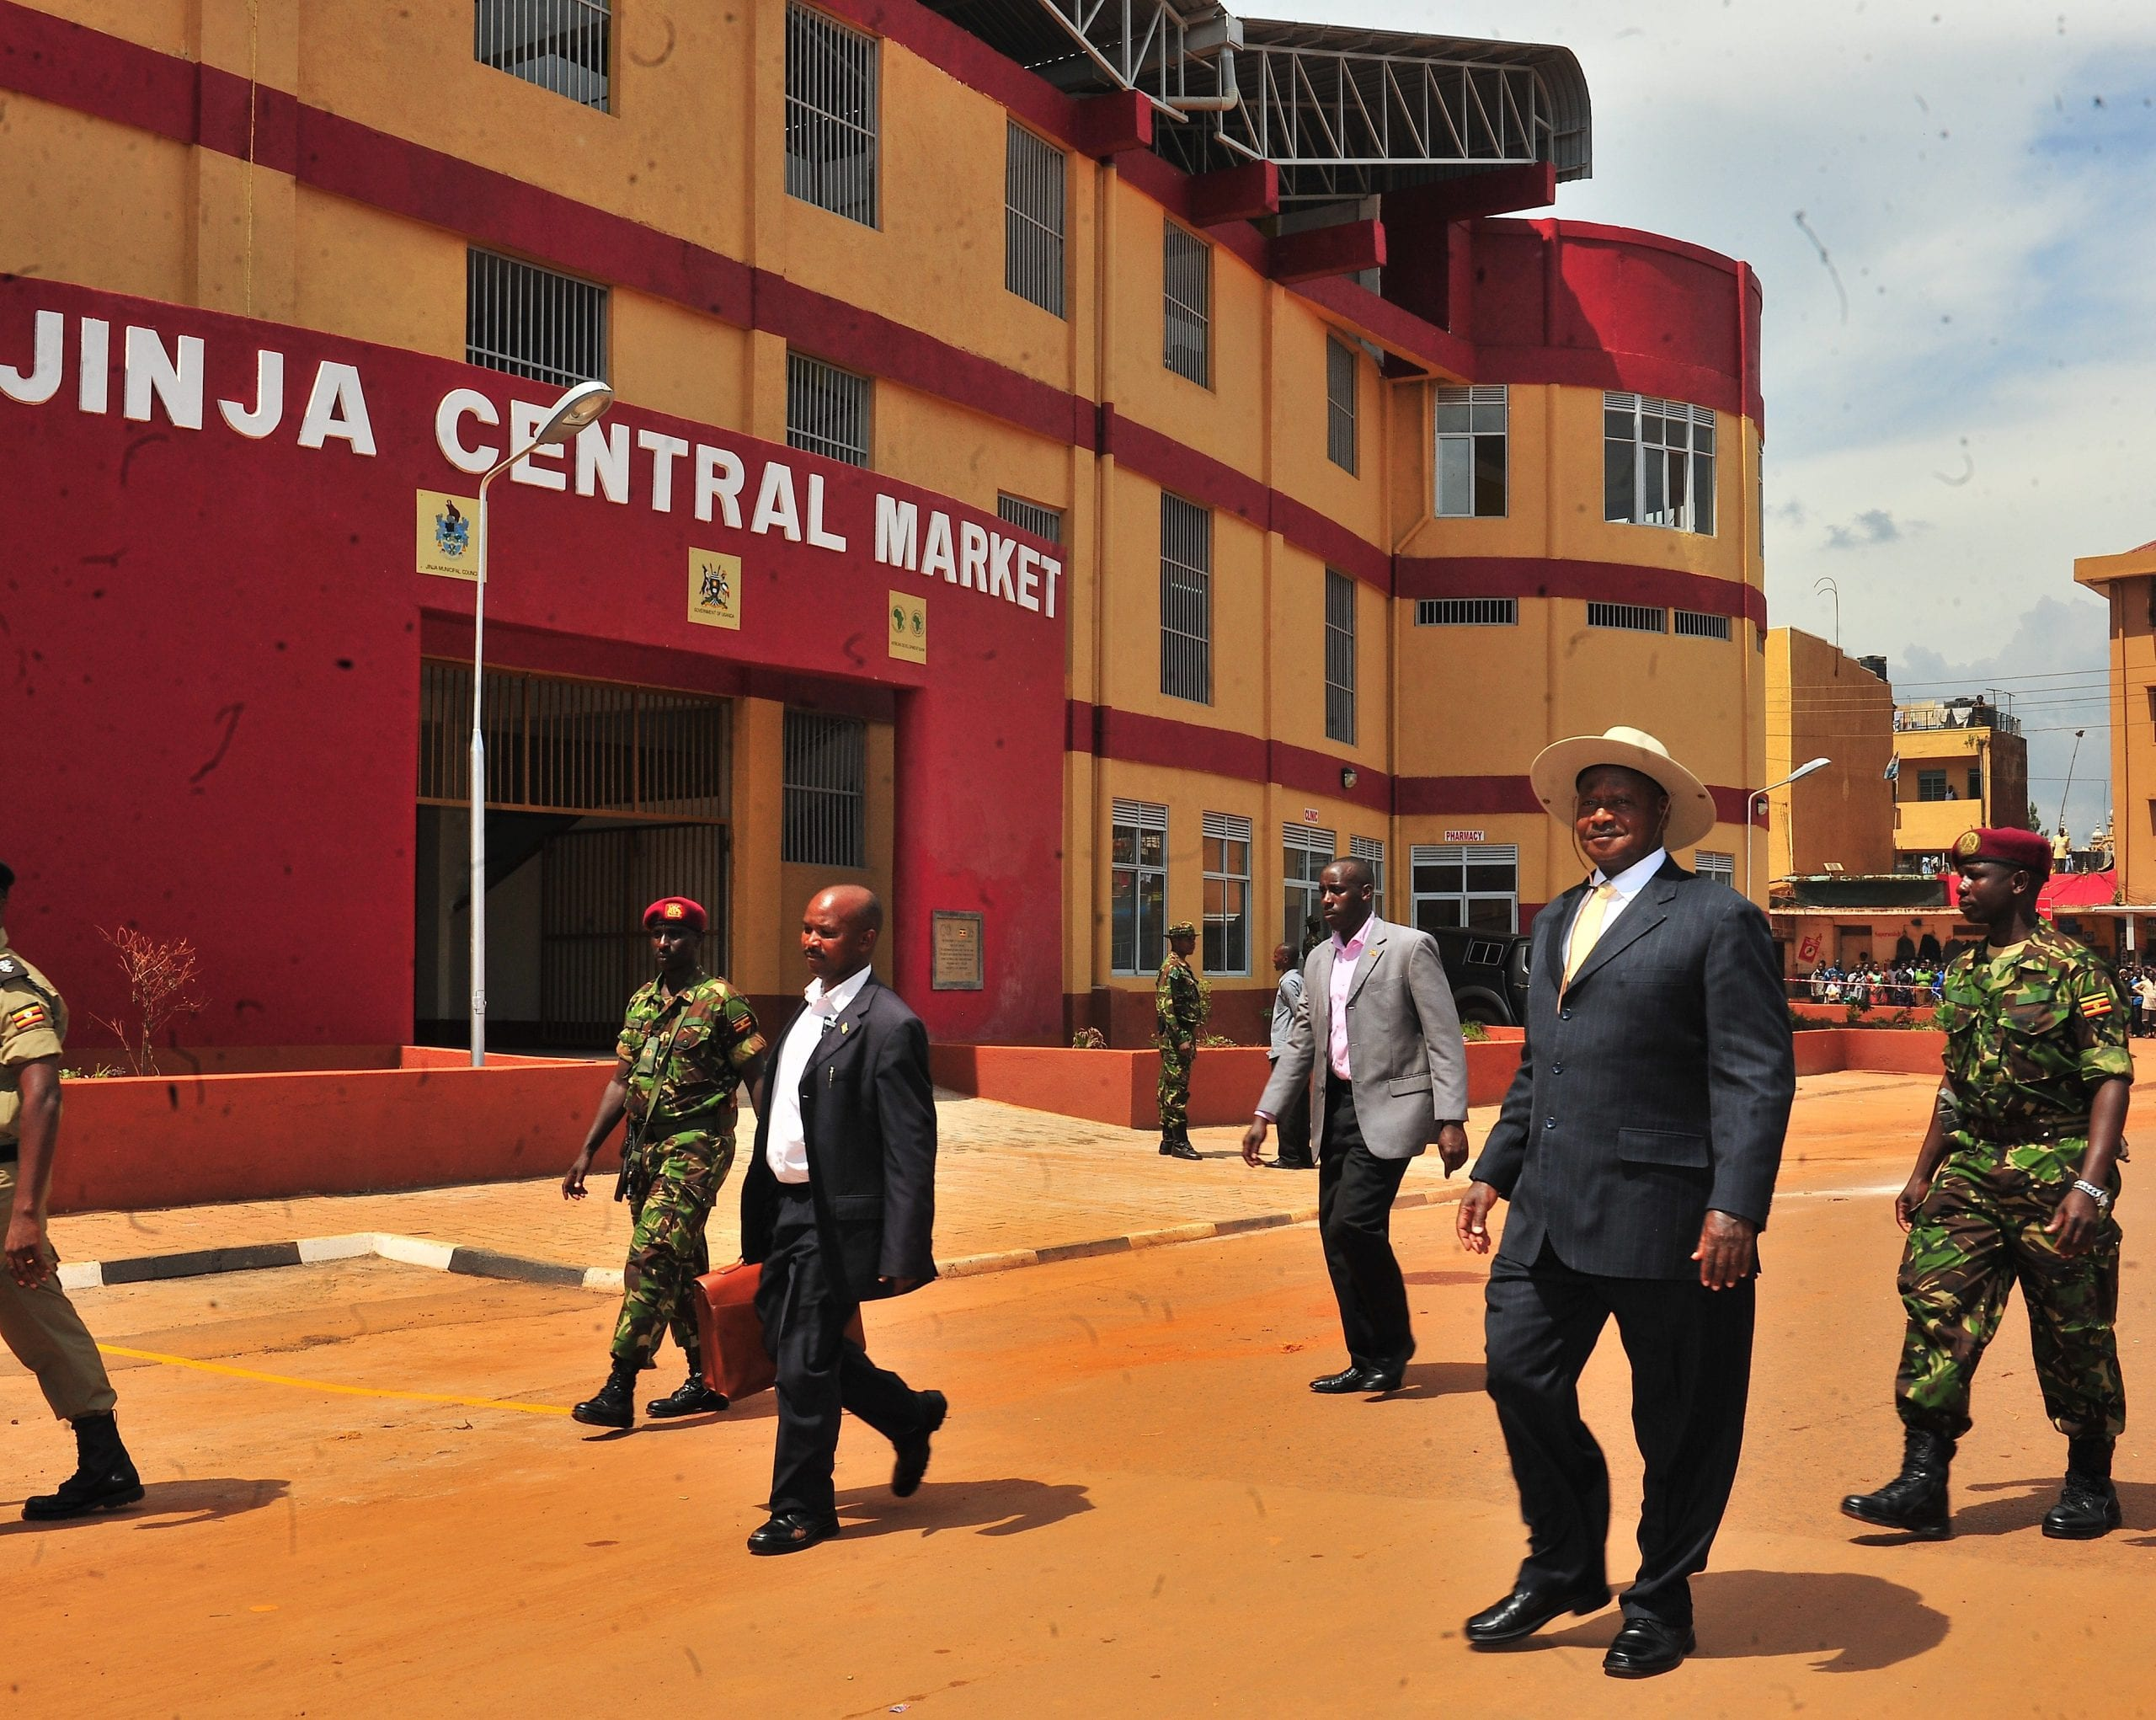 Jinja Central Market best markets in Uganda